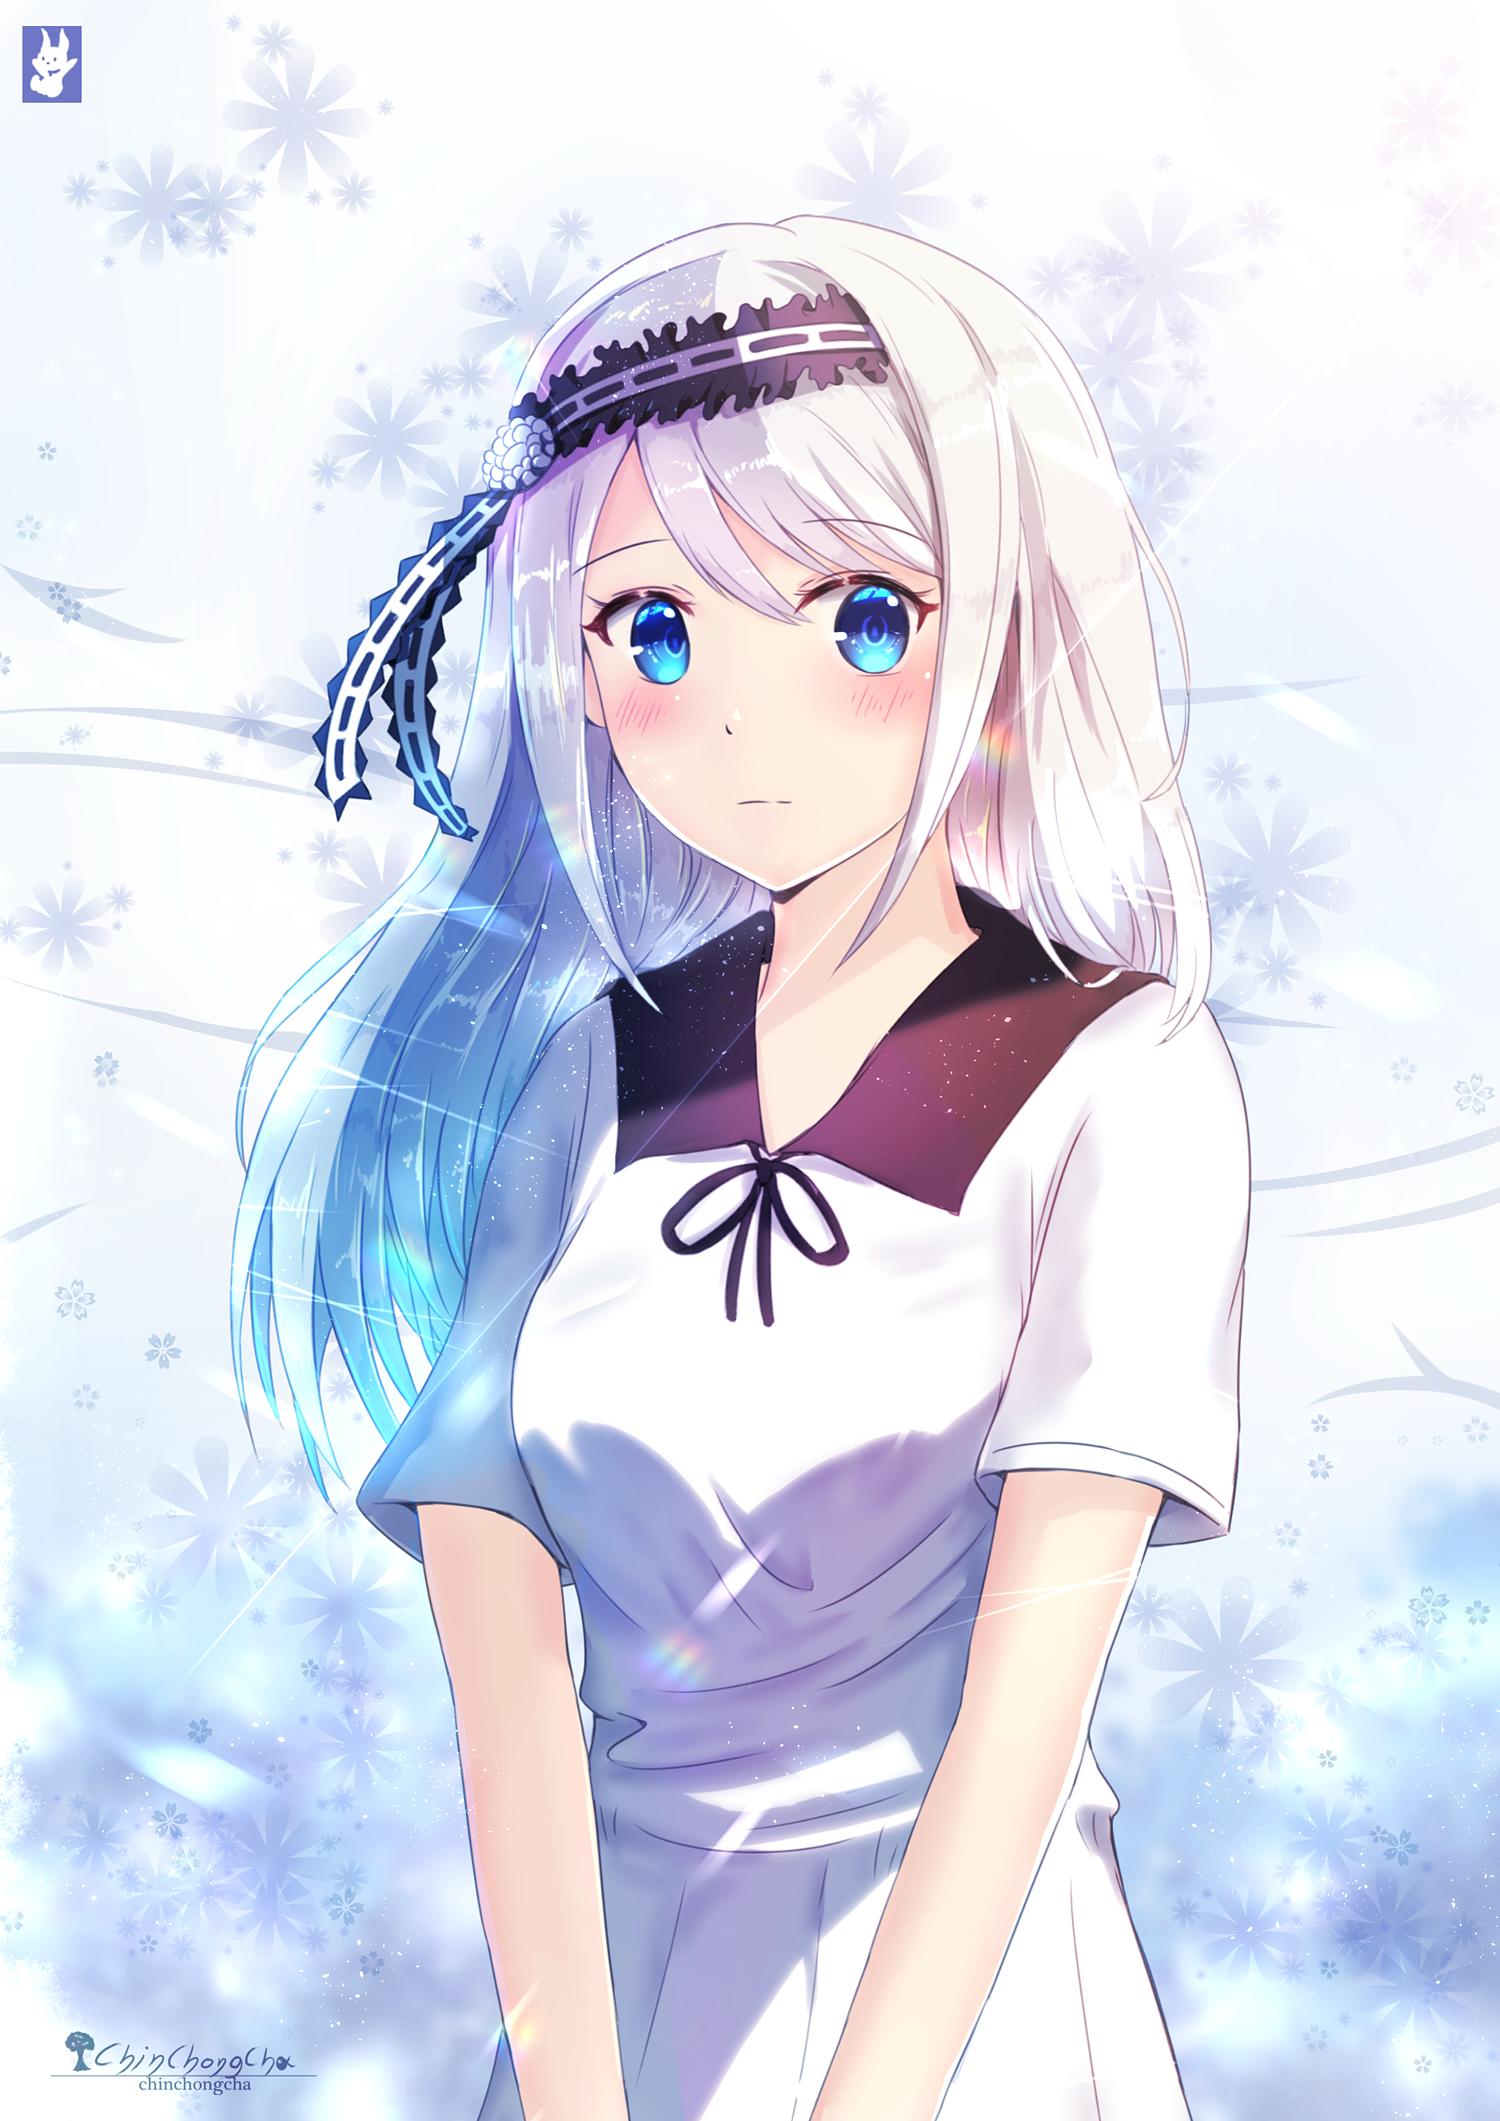 Pin on Anime / Manga